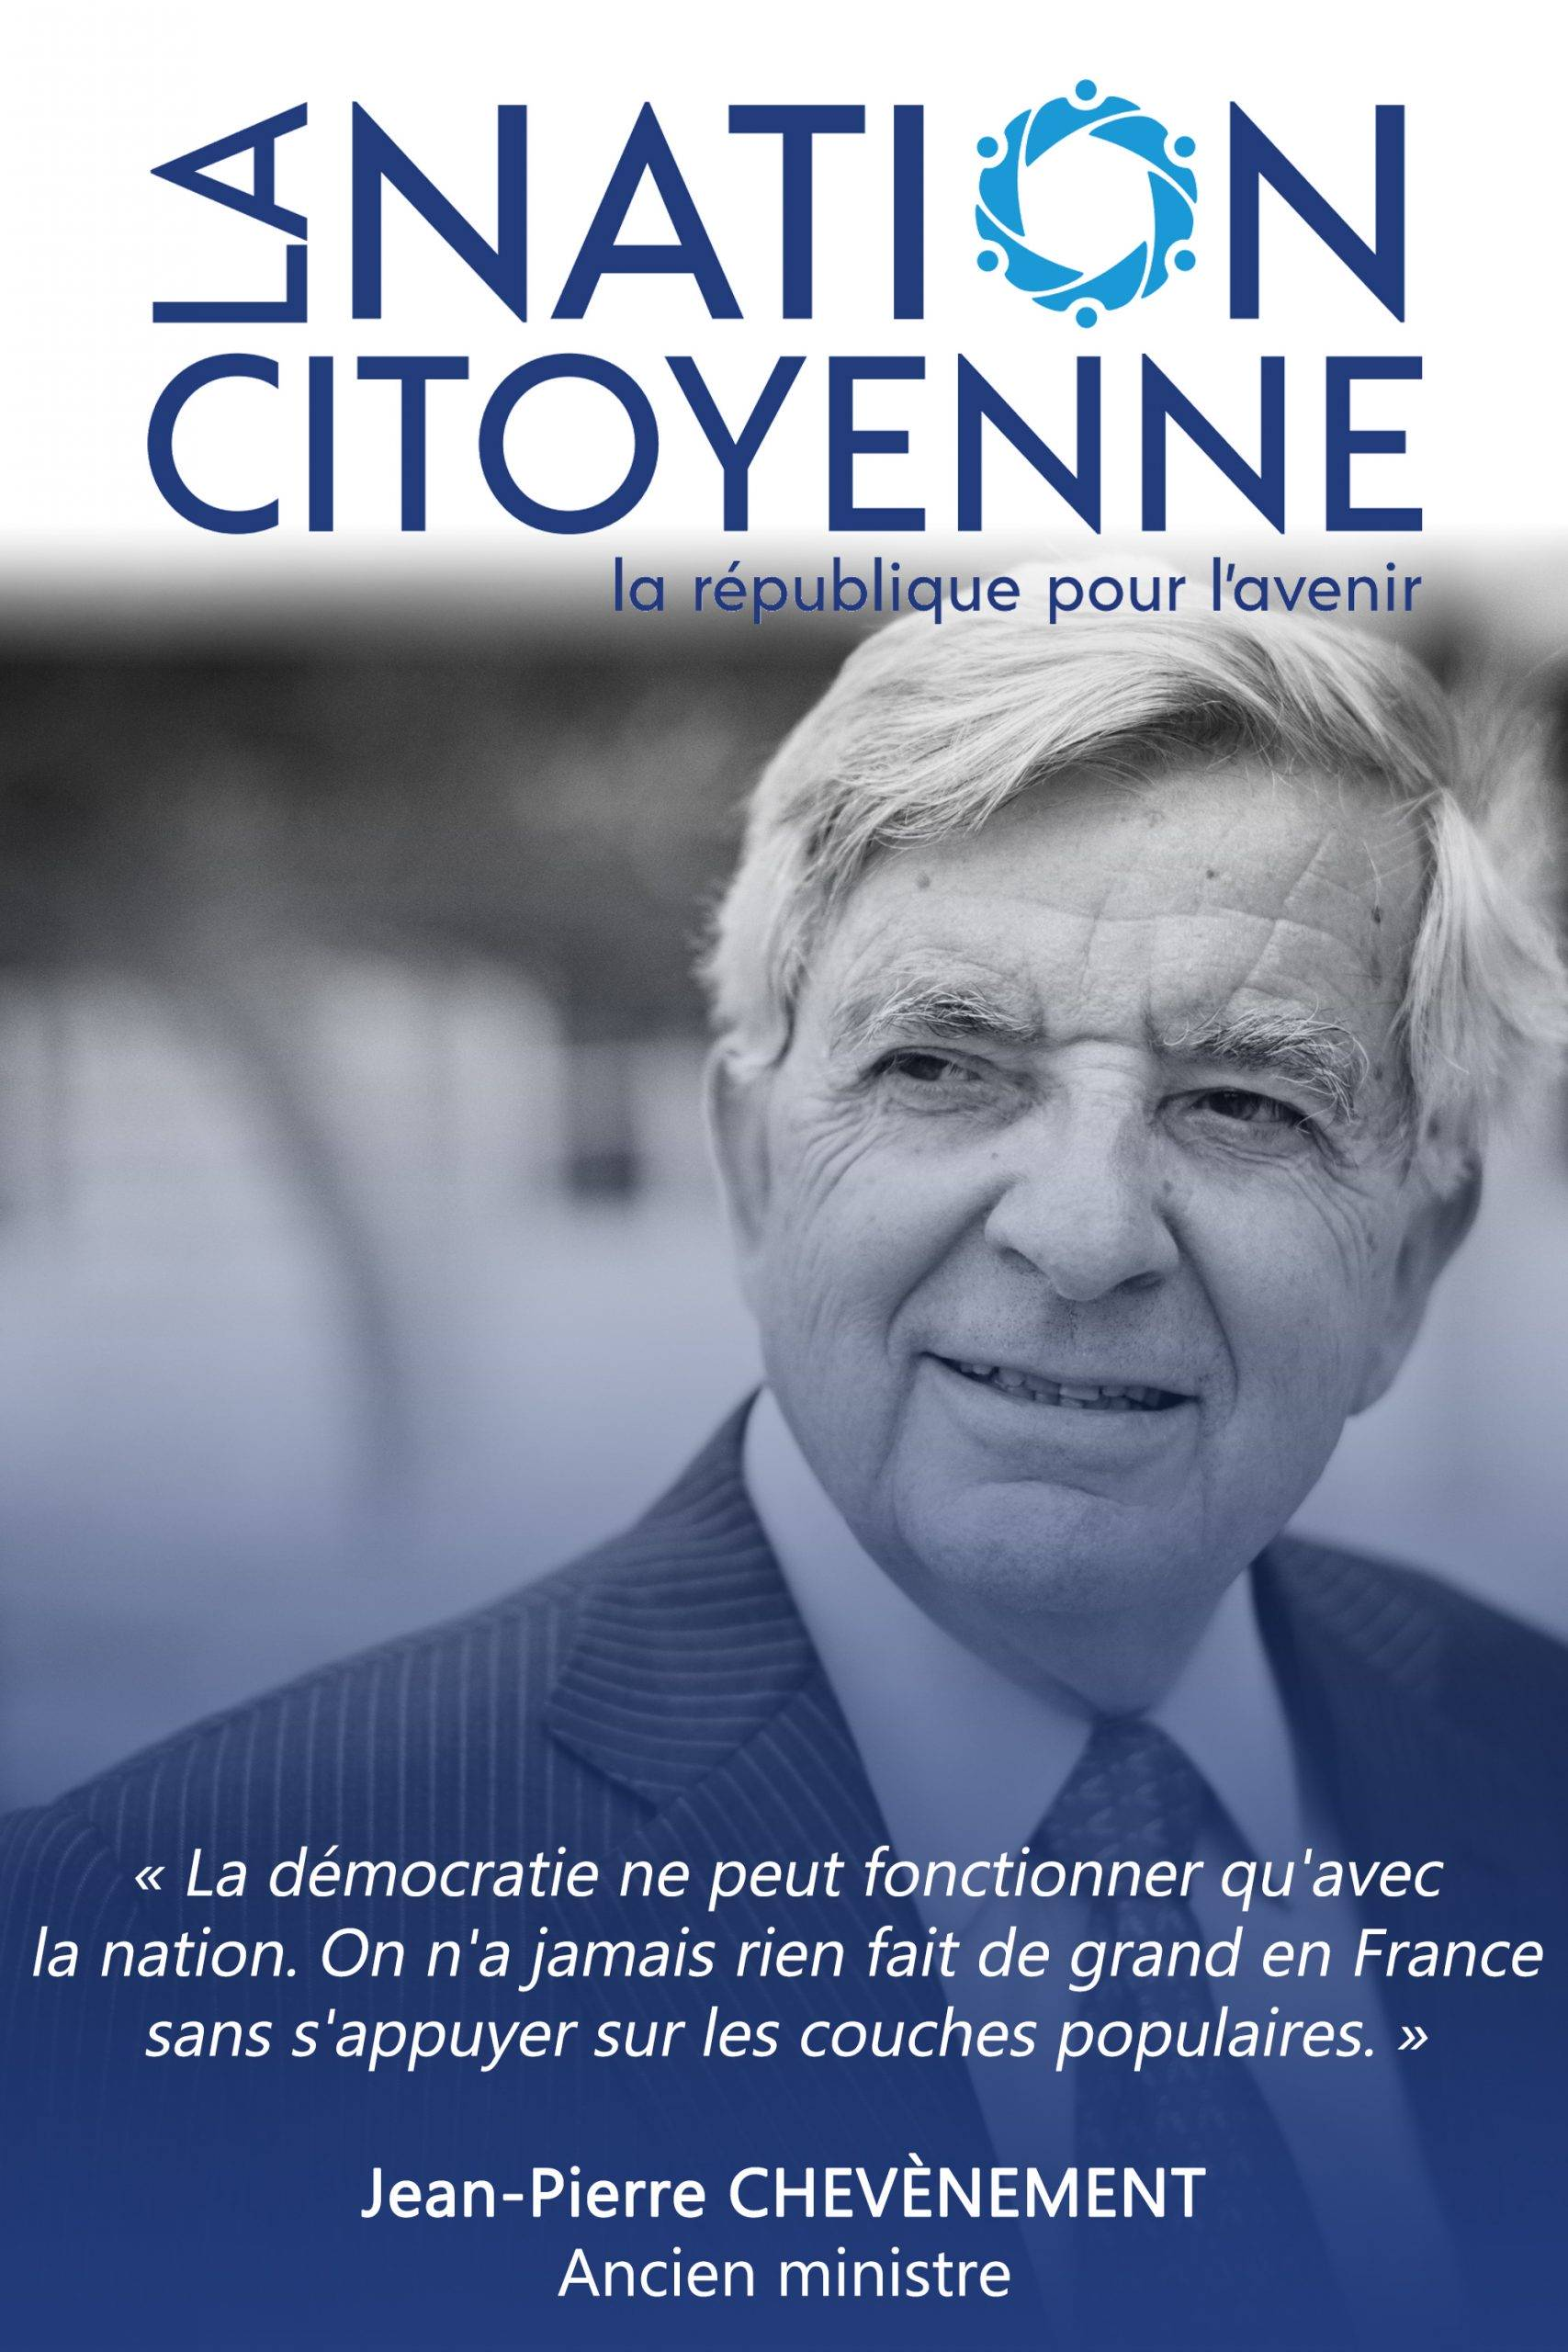 12. Jean Pierre chevènement